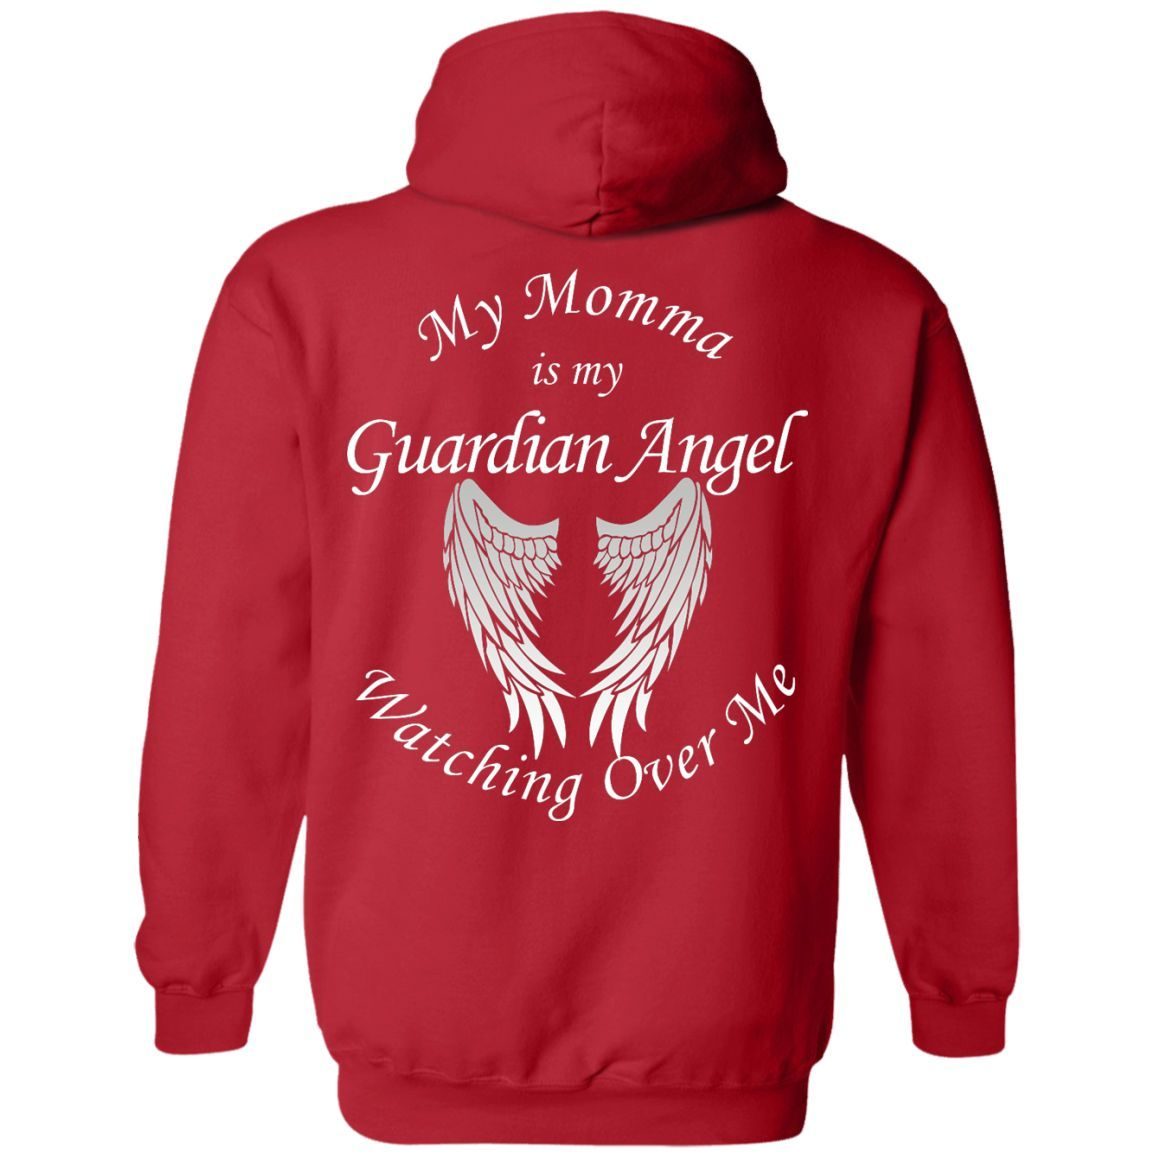 Momma Guardian Angel Pullover Hoodie